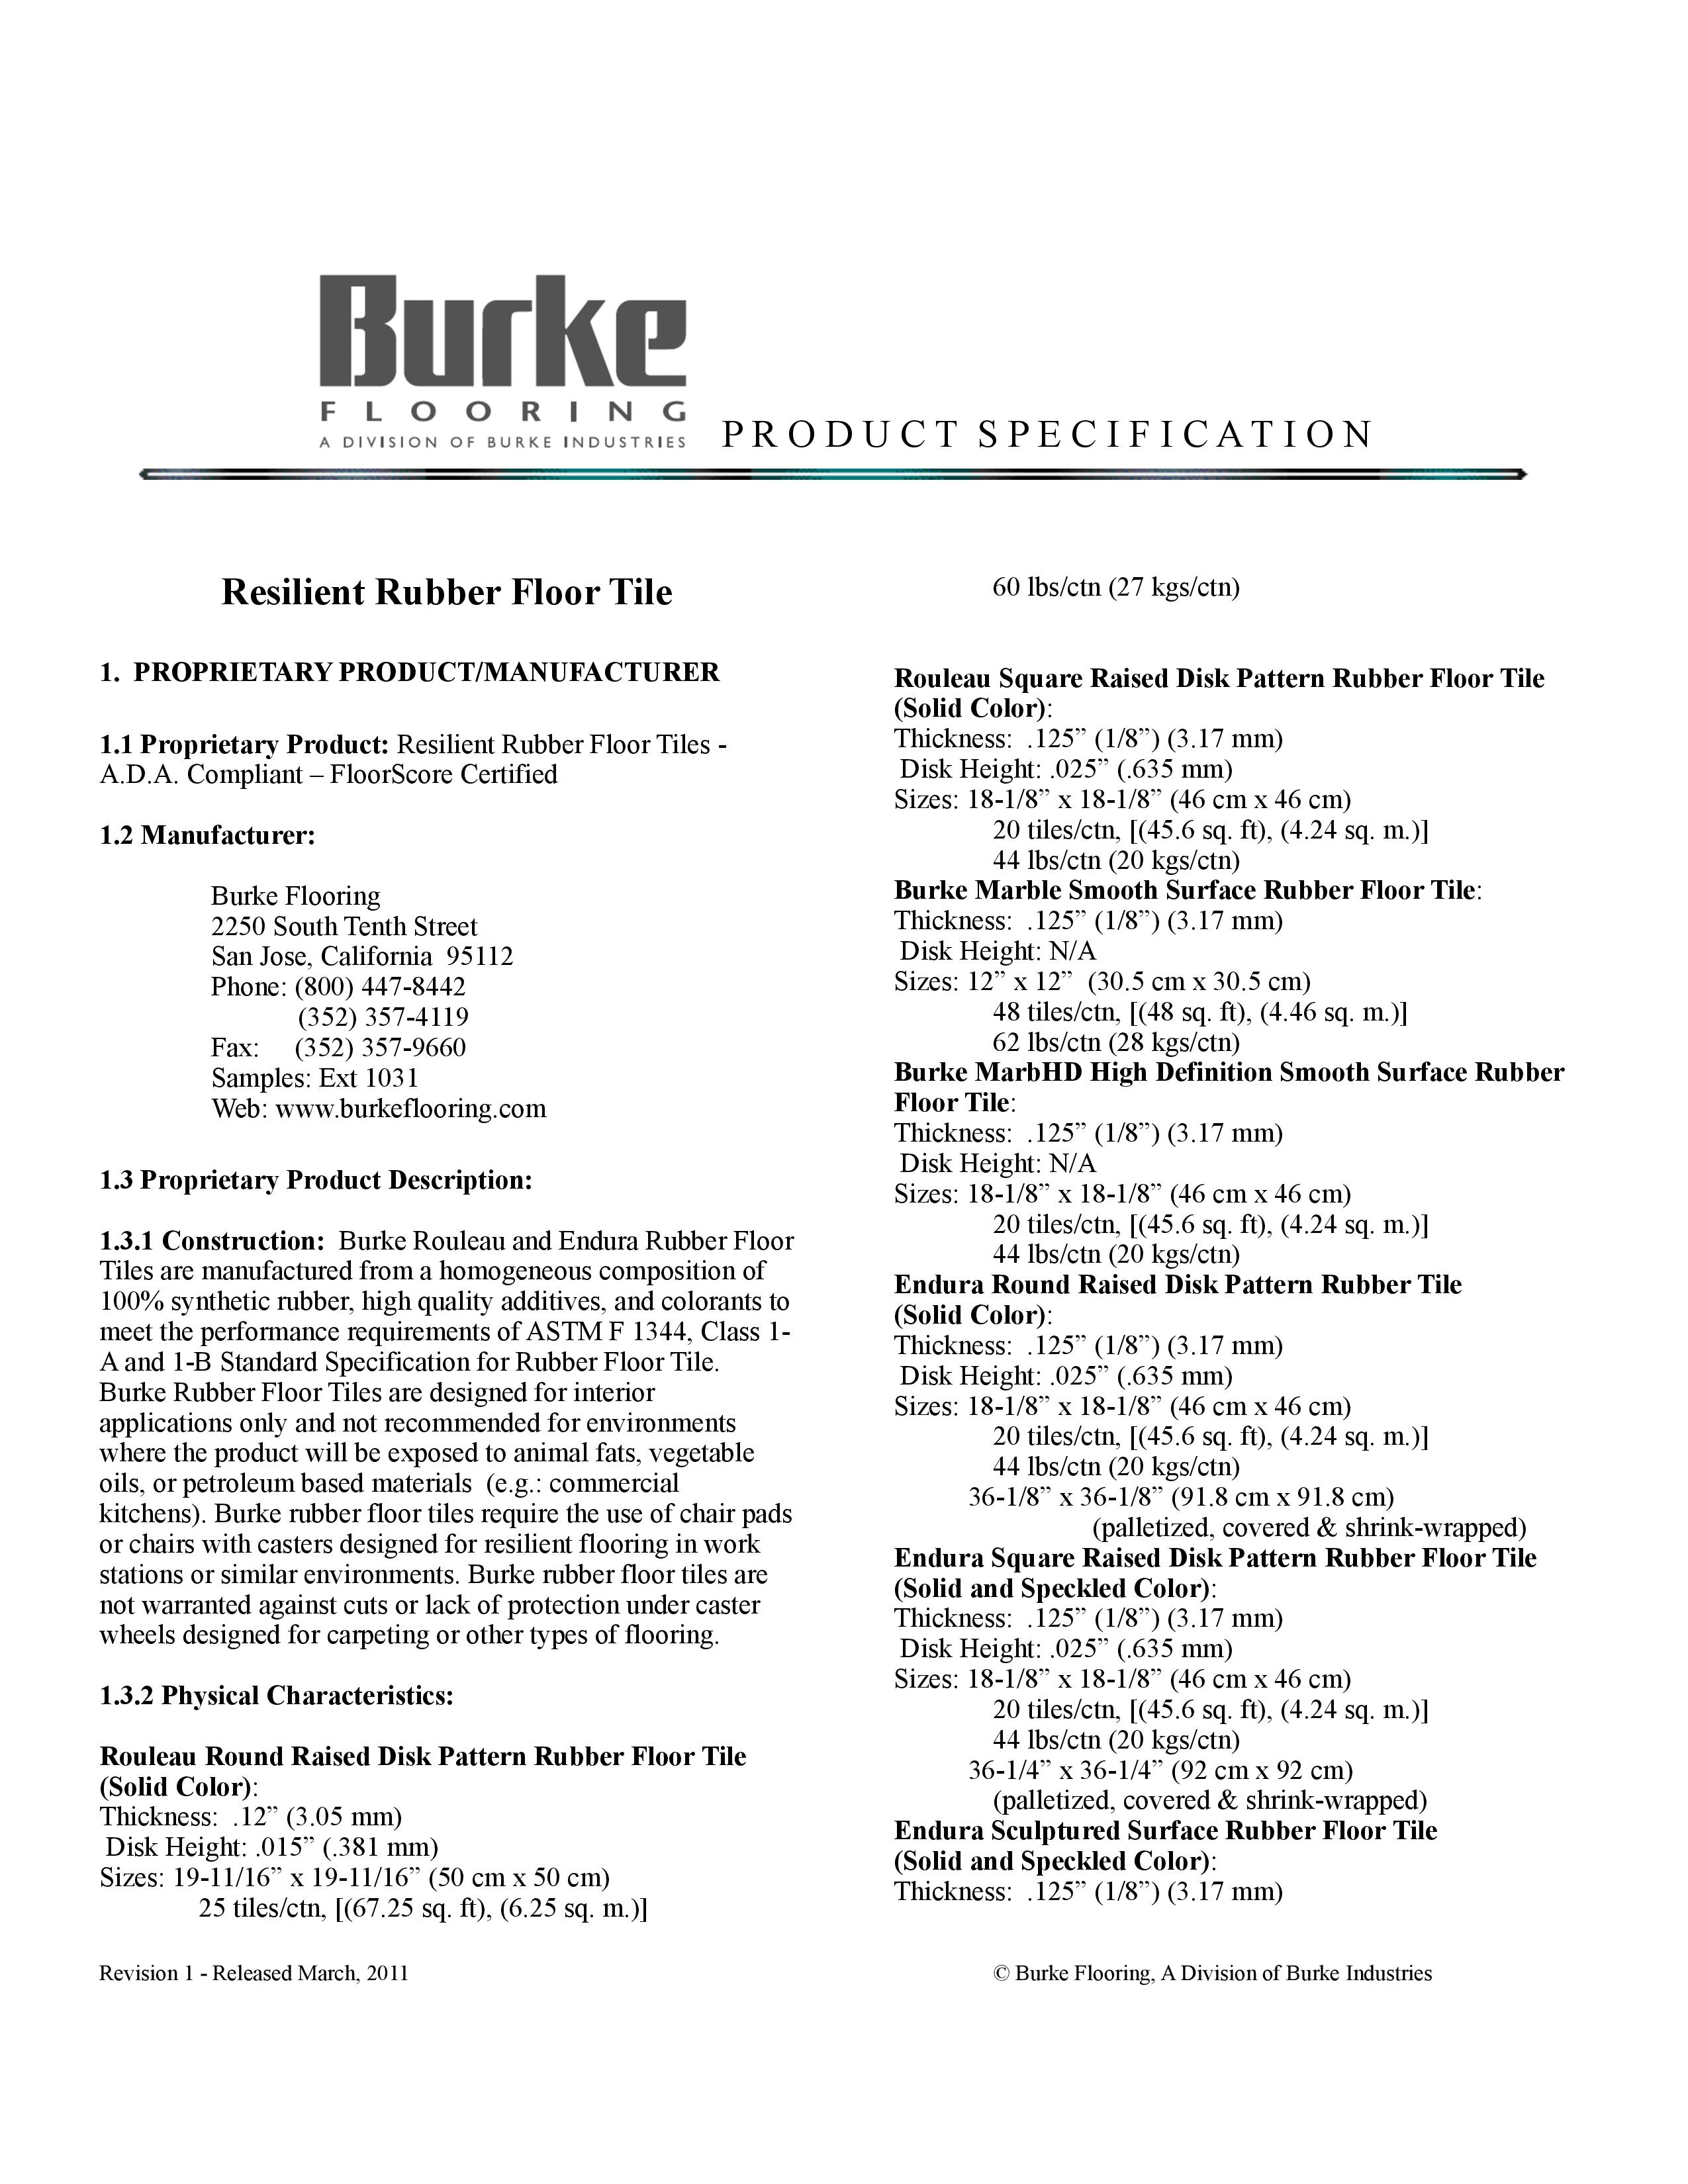 Specifications Endura Flecksibles Rubber Tile Flooring